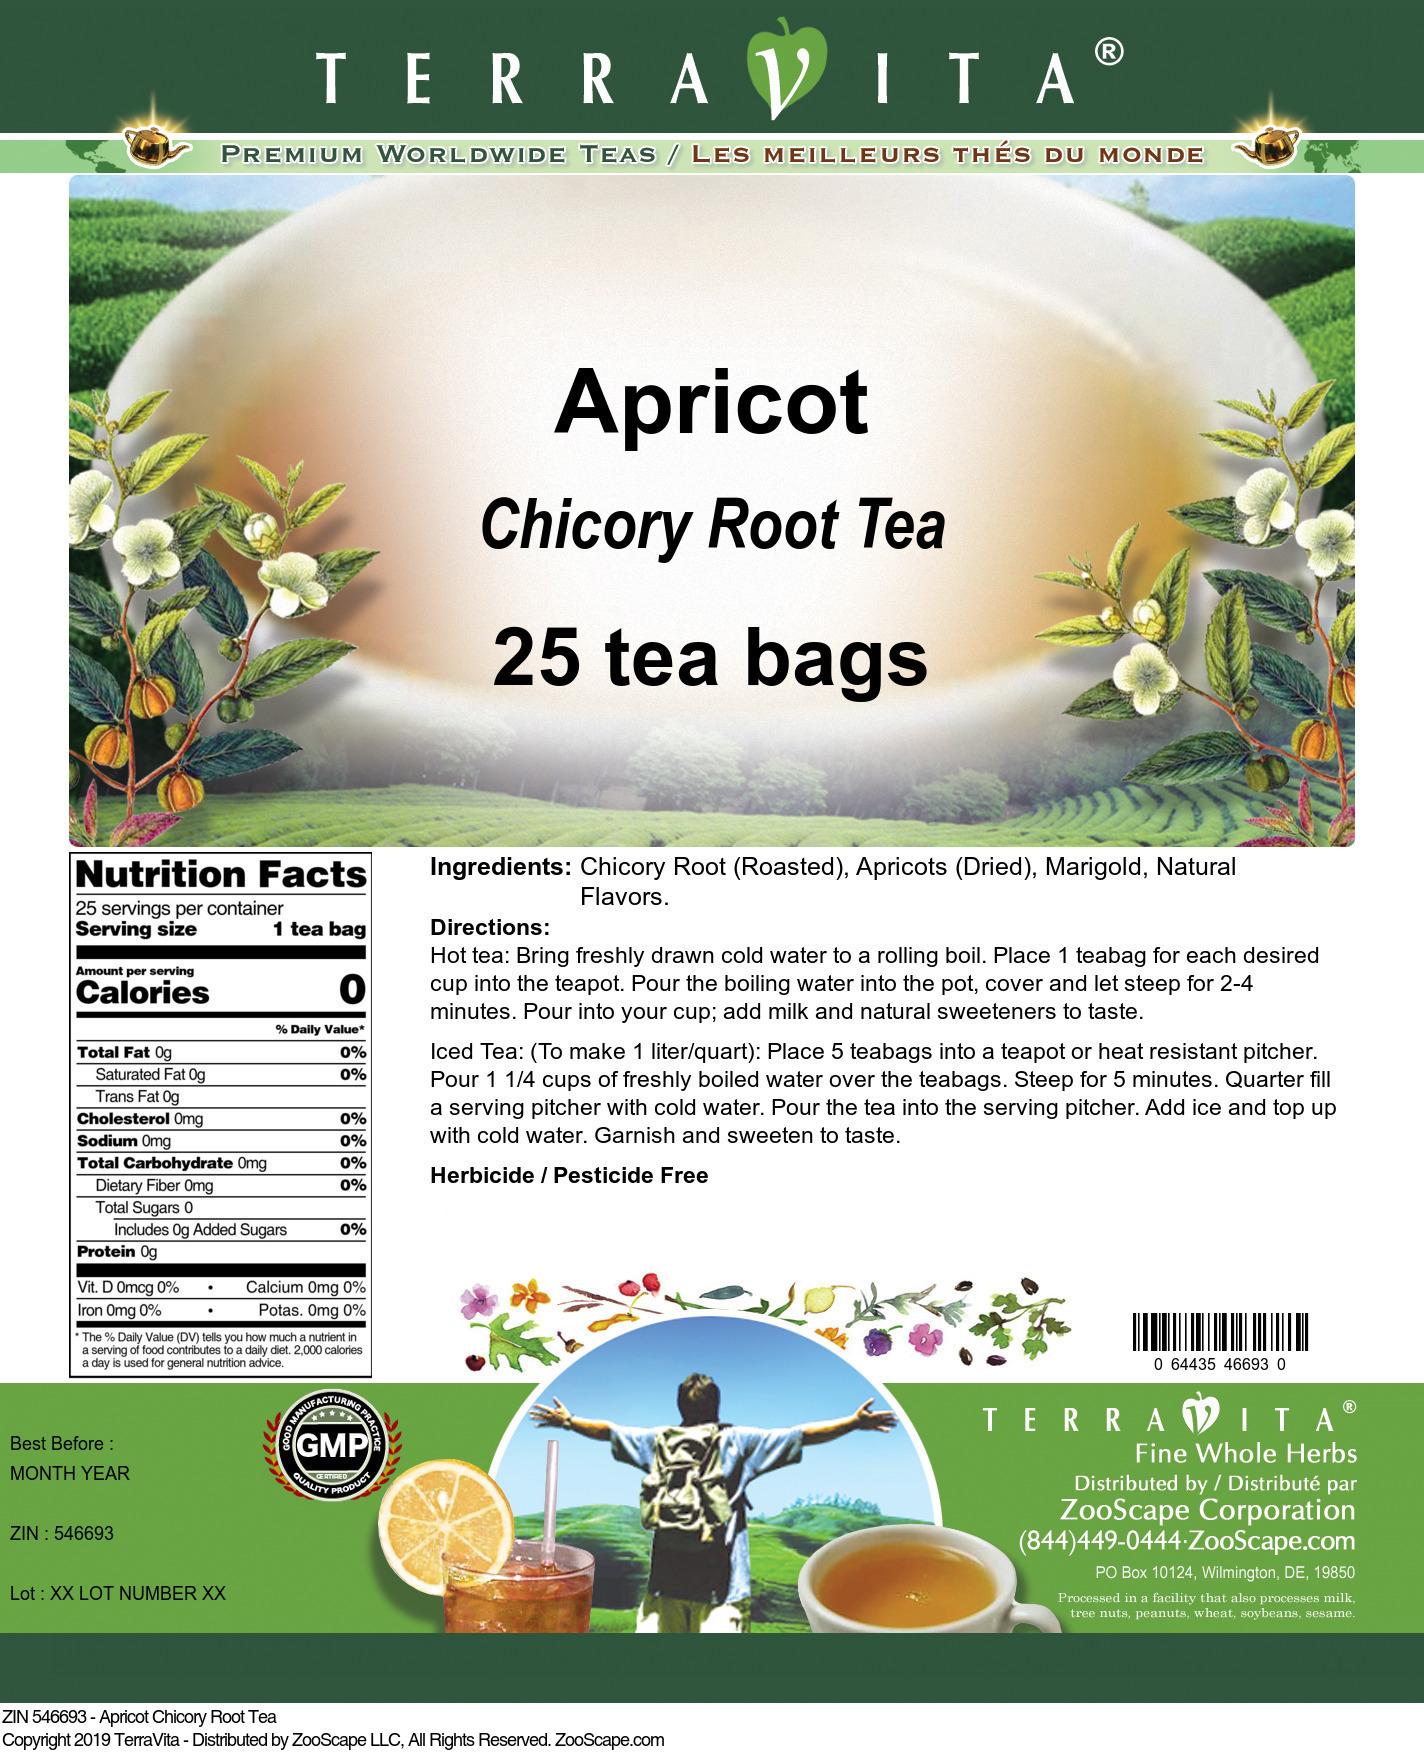 Apricot Chicory Root